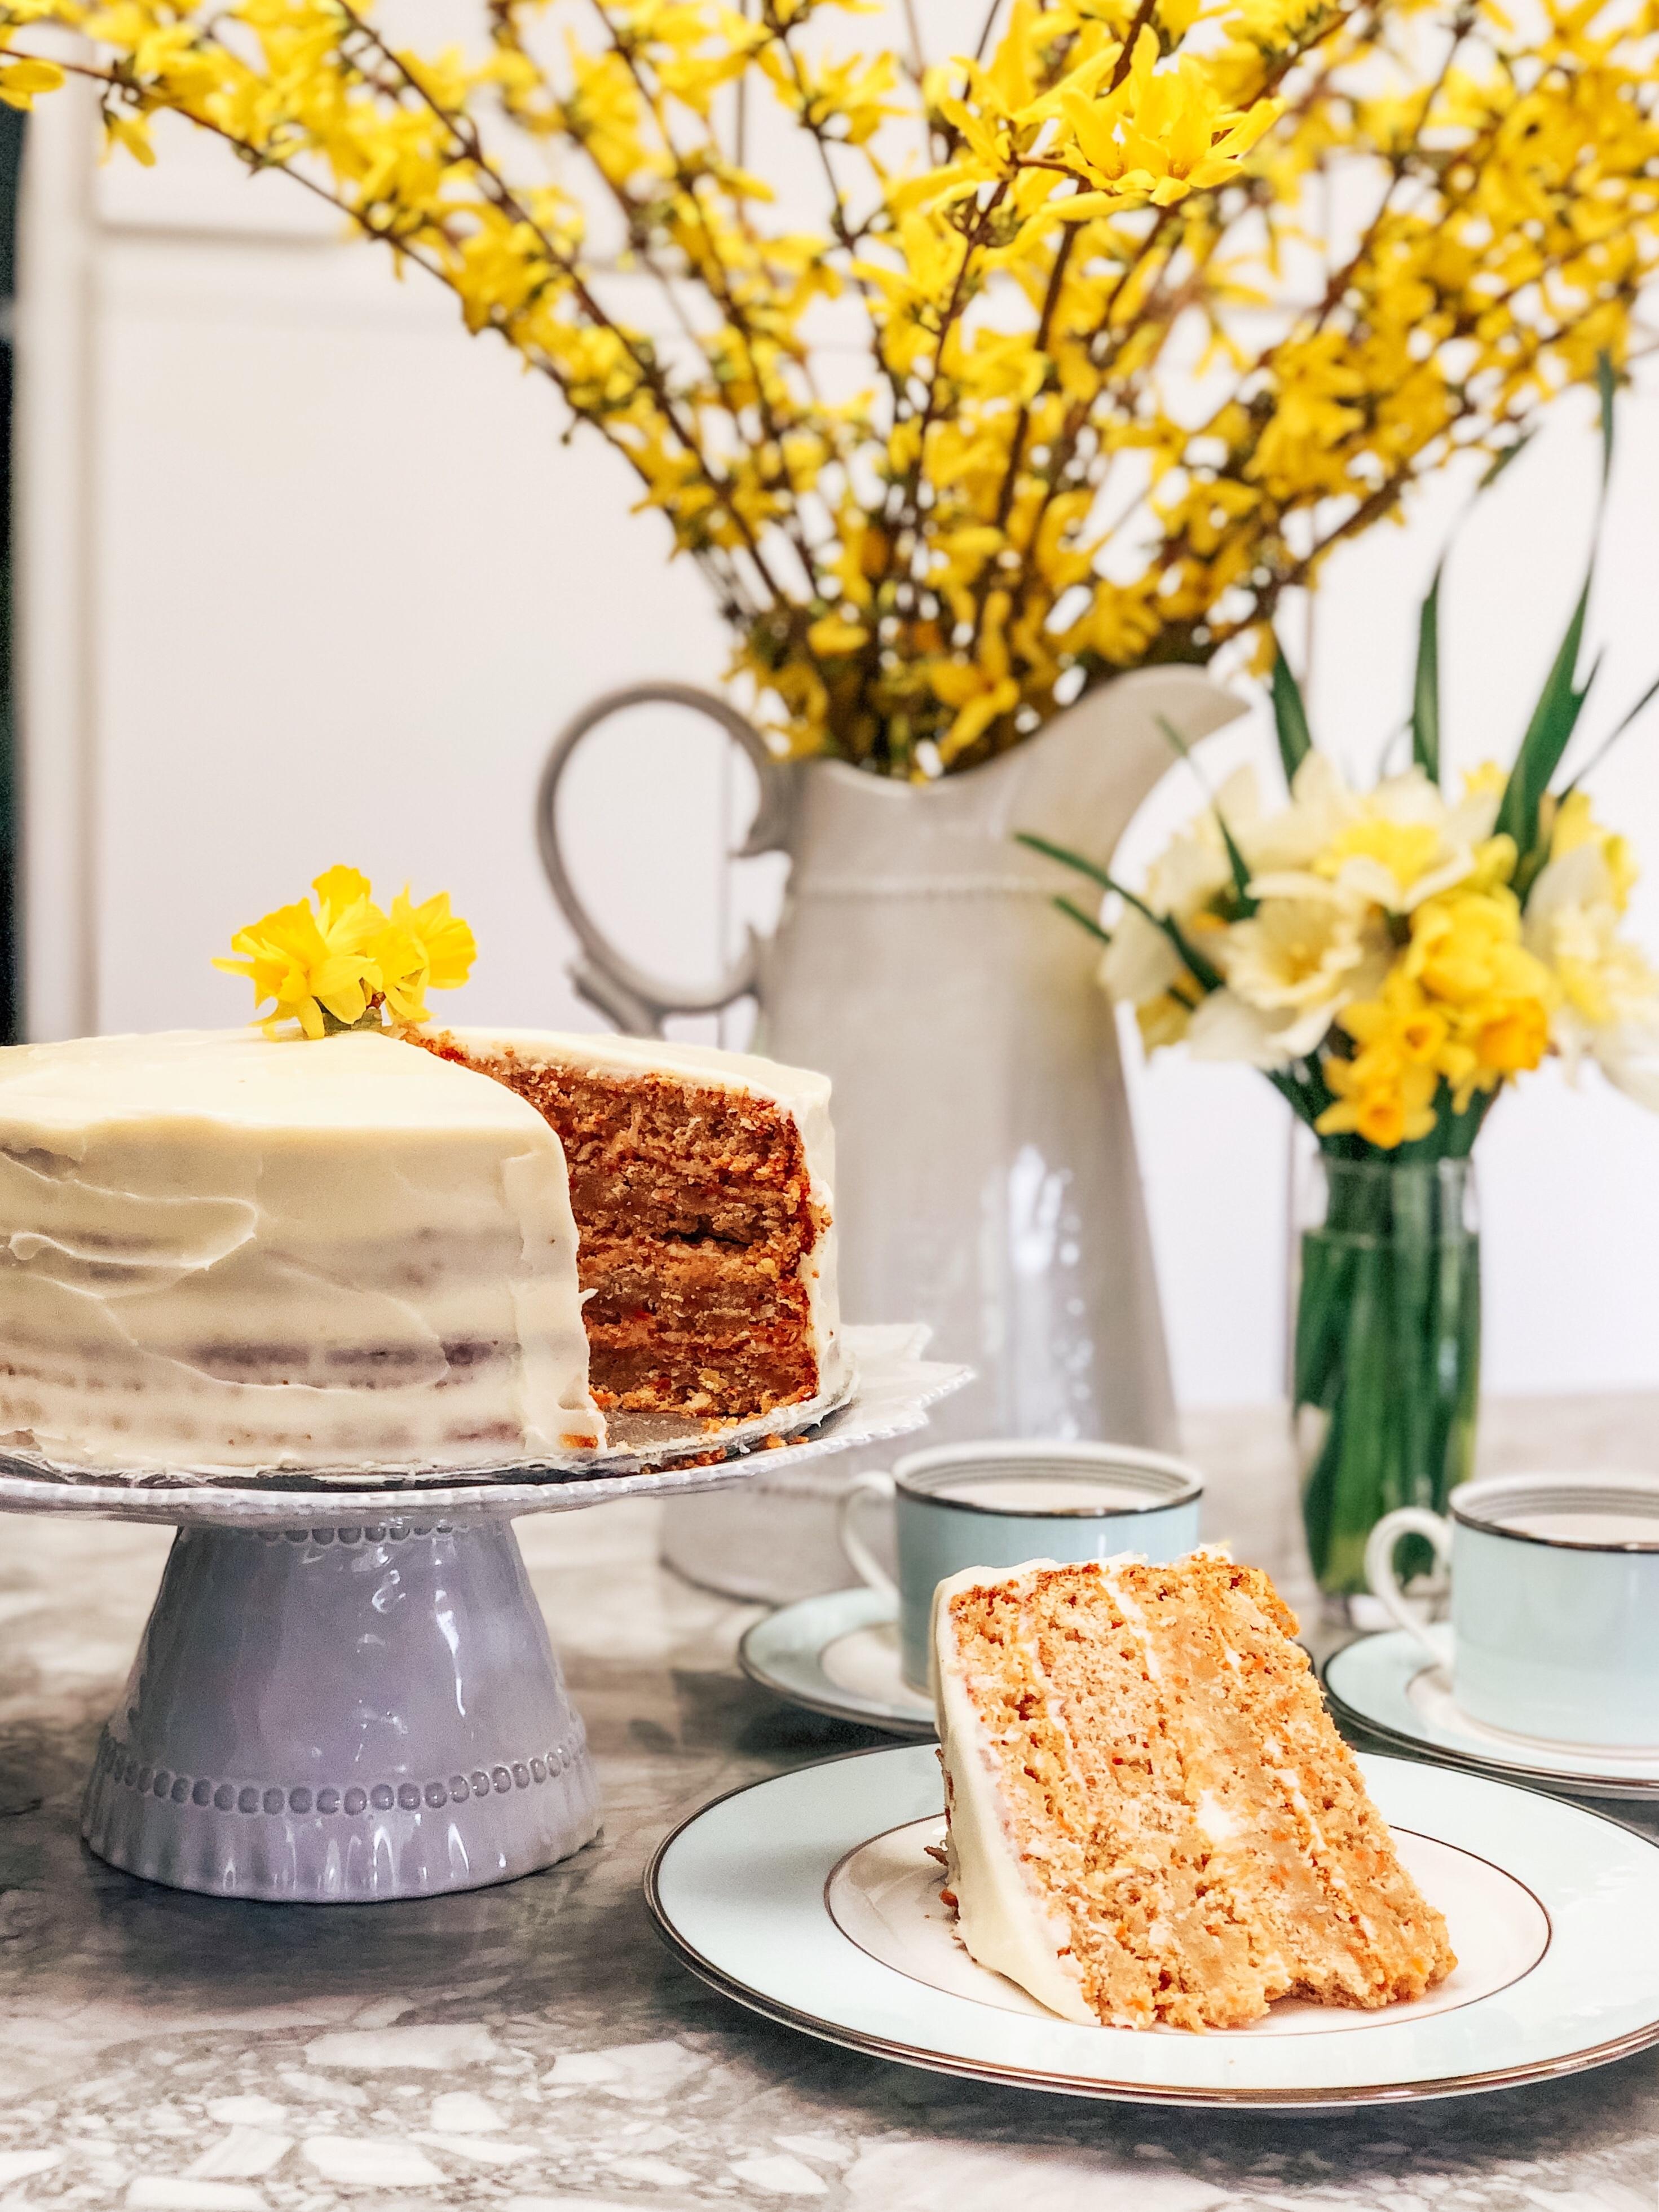 Reduced Sugar Carrot Cake